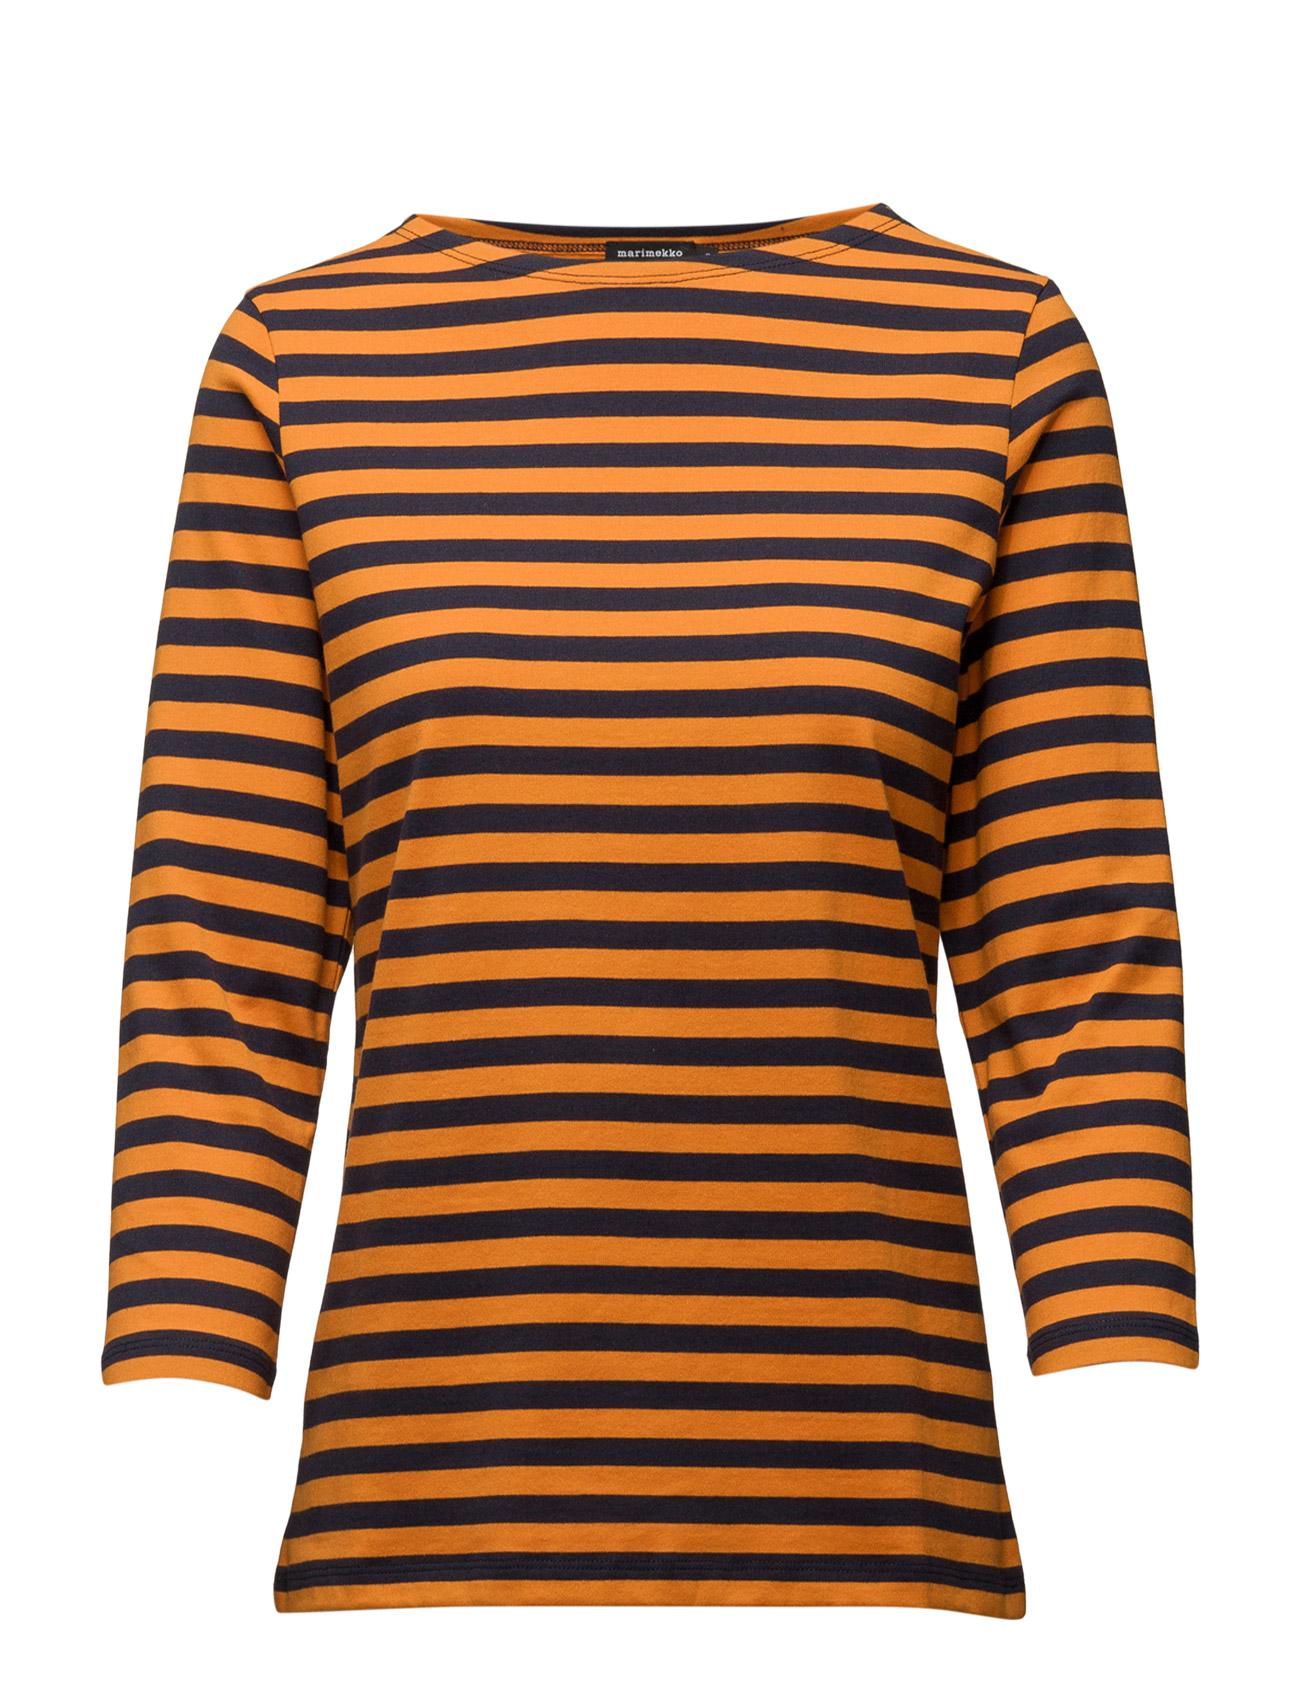 Ilma 2017 Marimekko T-shirts & toppe til Kvinder i Orange Mørkeblå